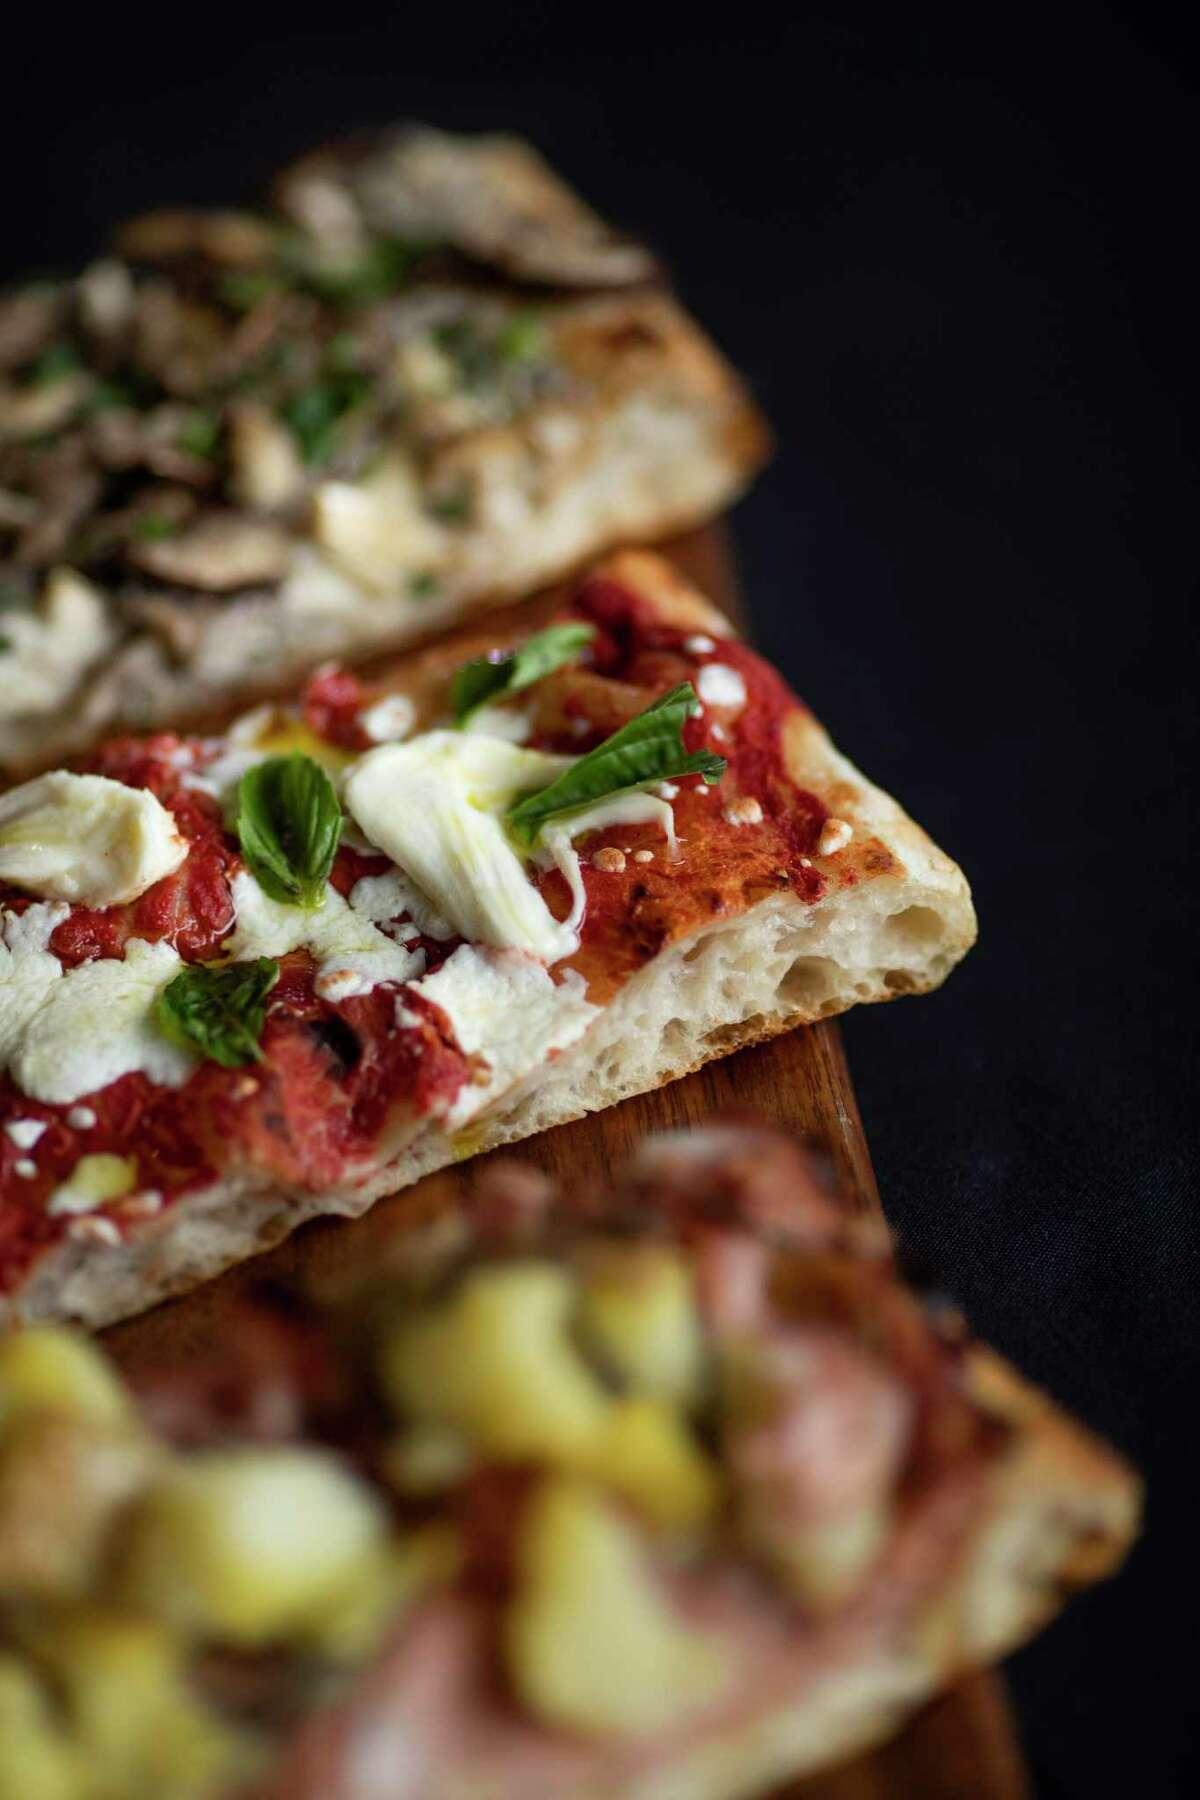 BOH Pasta & Pizza's Margherita with fresh mozzarella, tomato, 1836 olive oil, and basil.